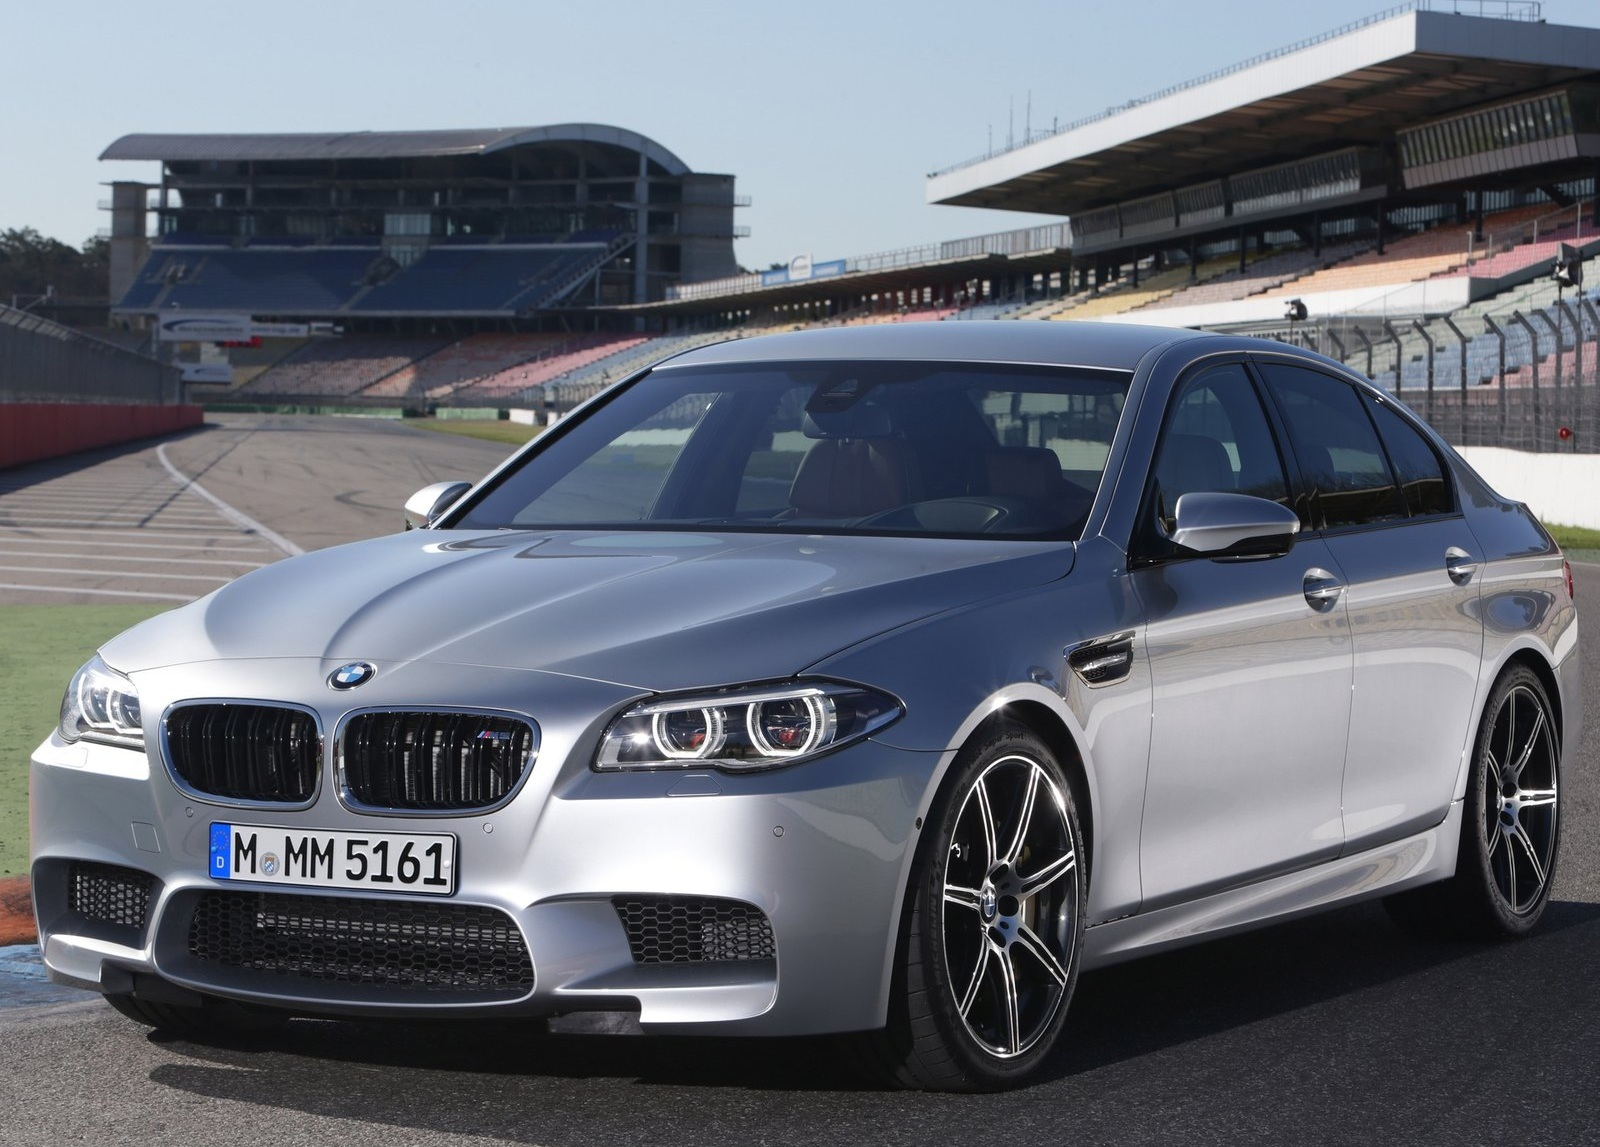 BMW M5 2014 new